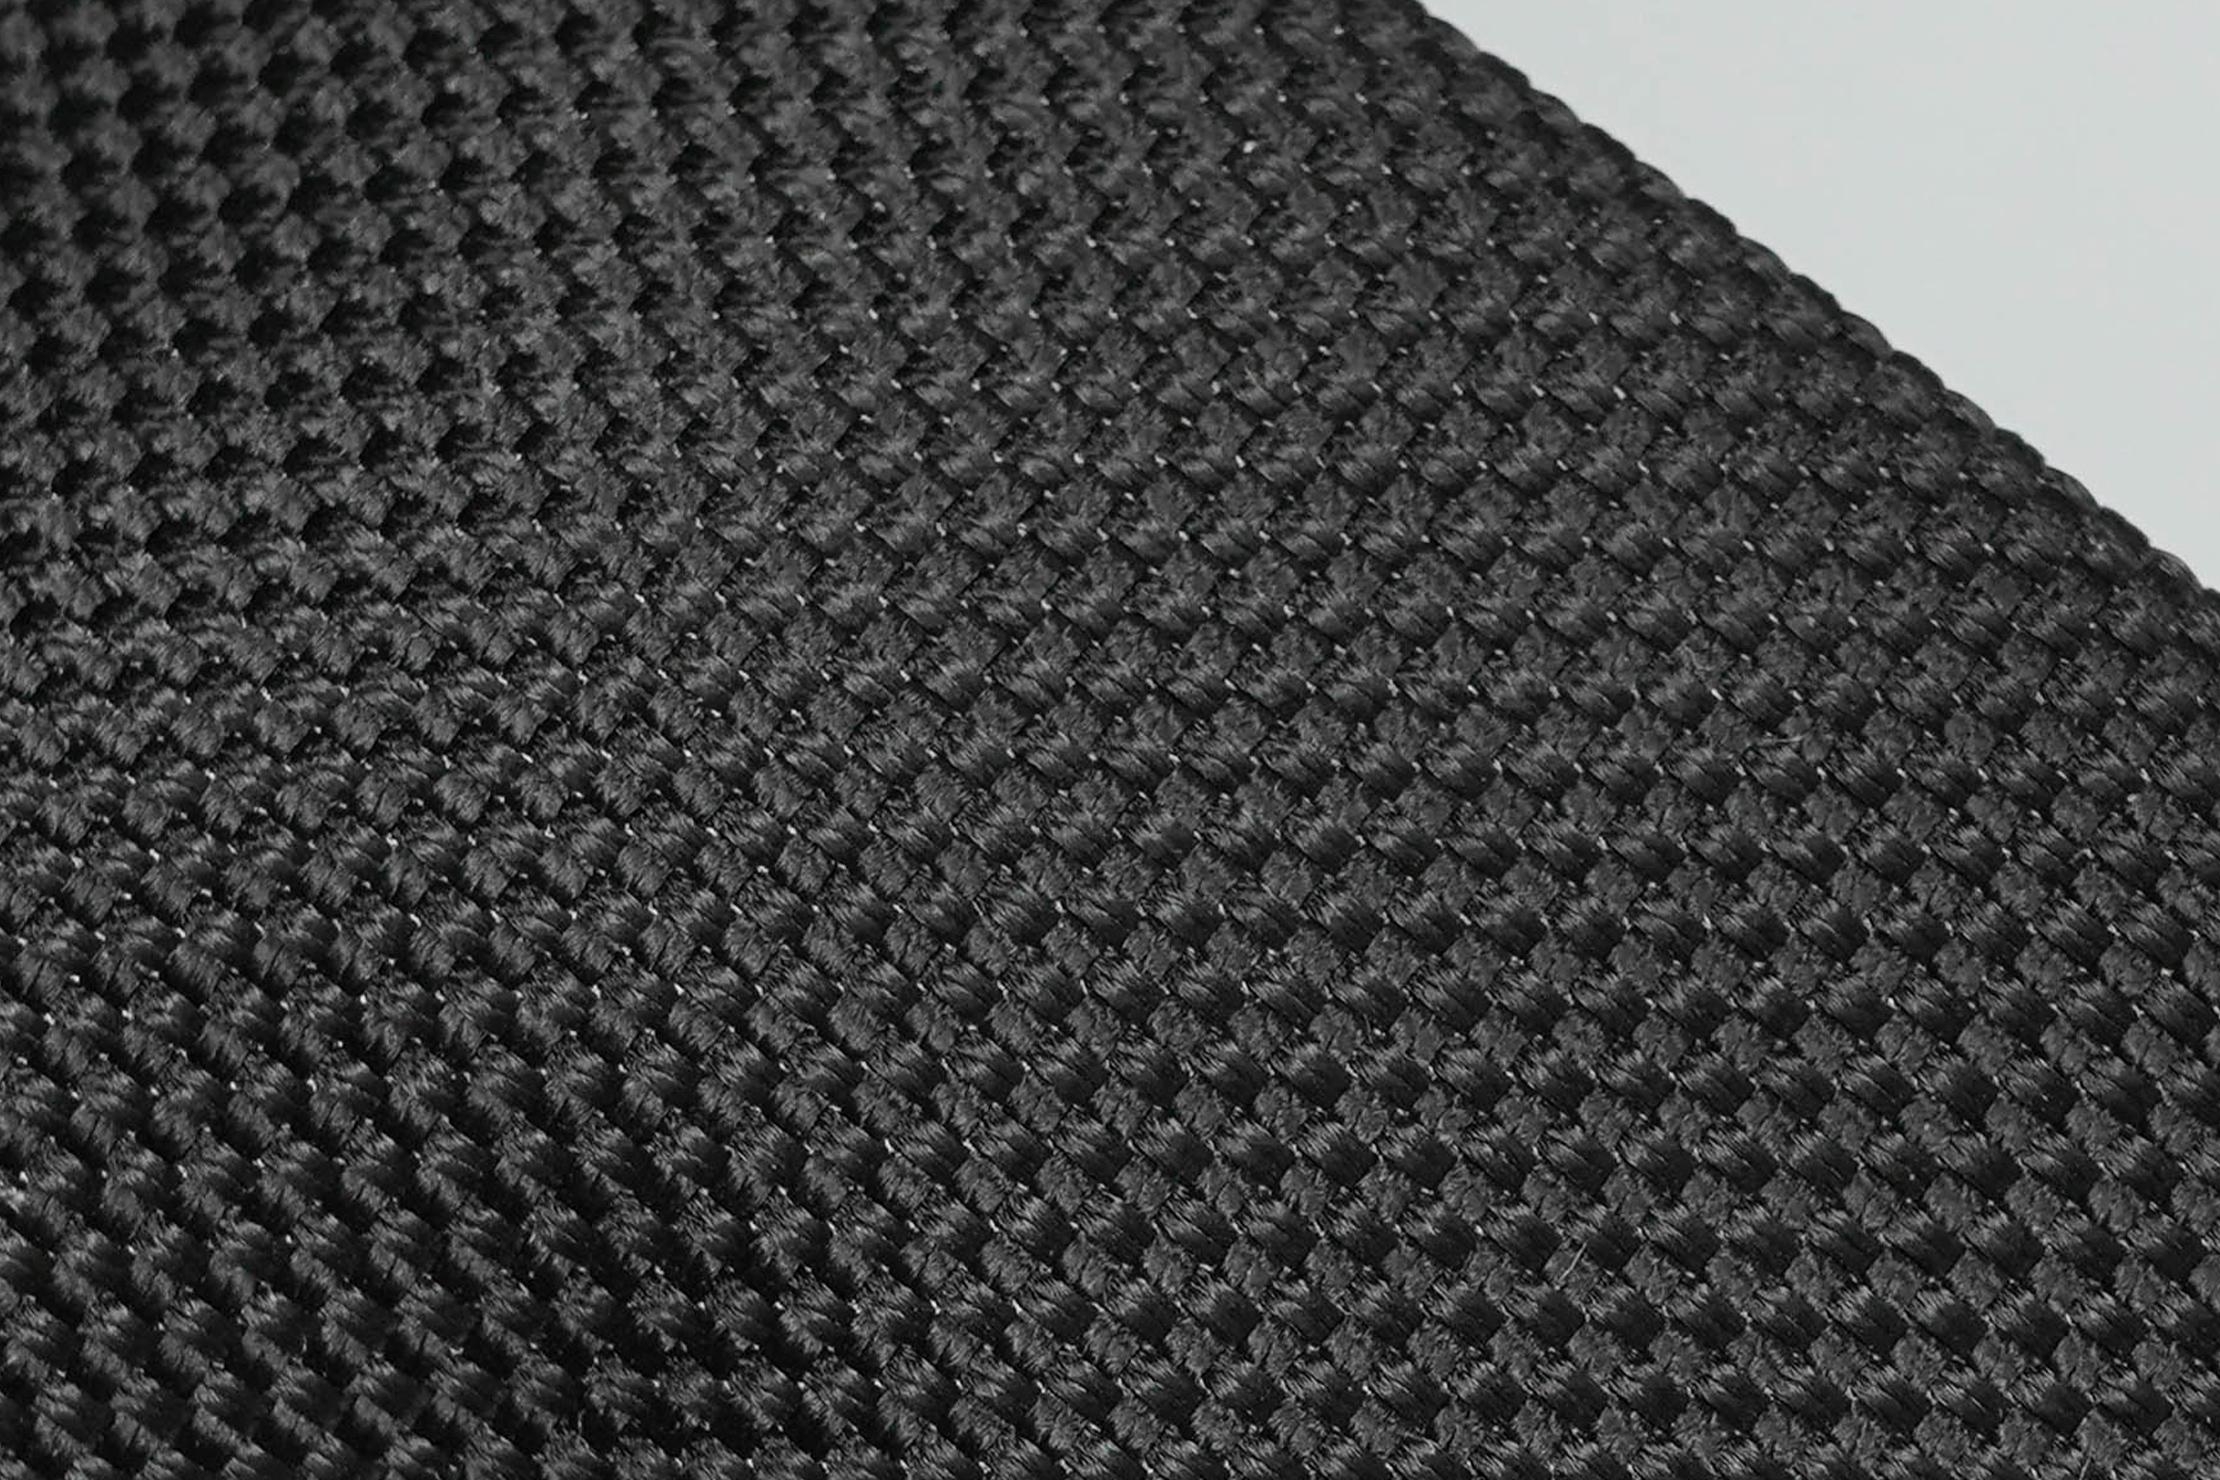 CODEOFBELL X-POD Material